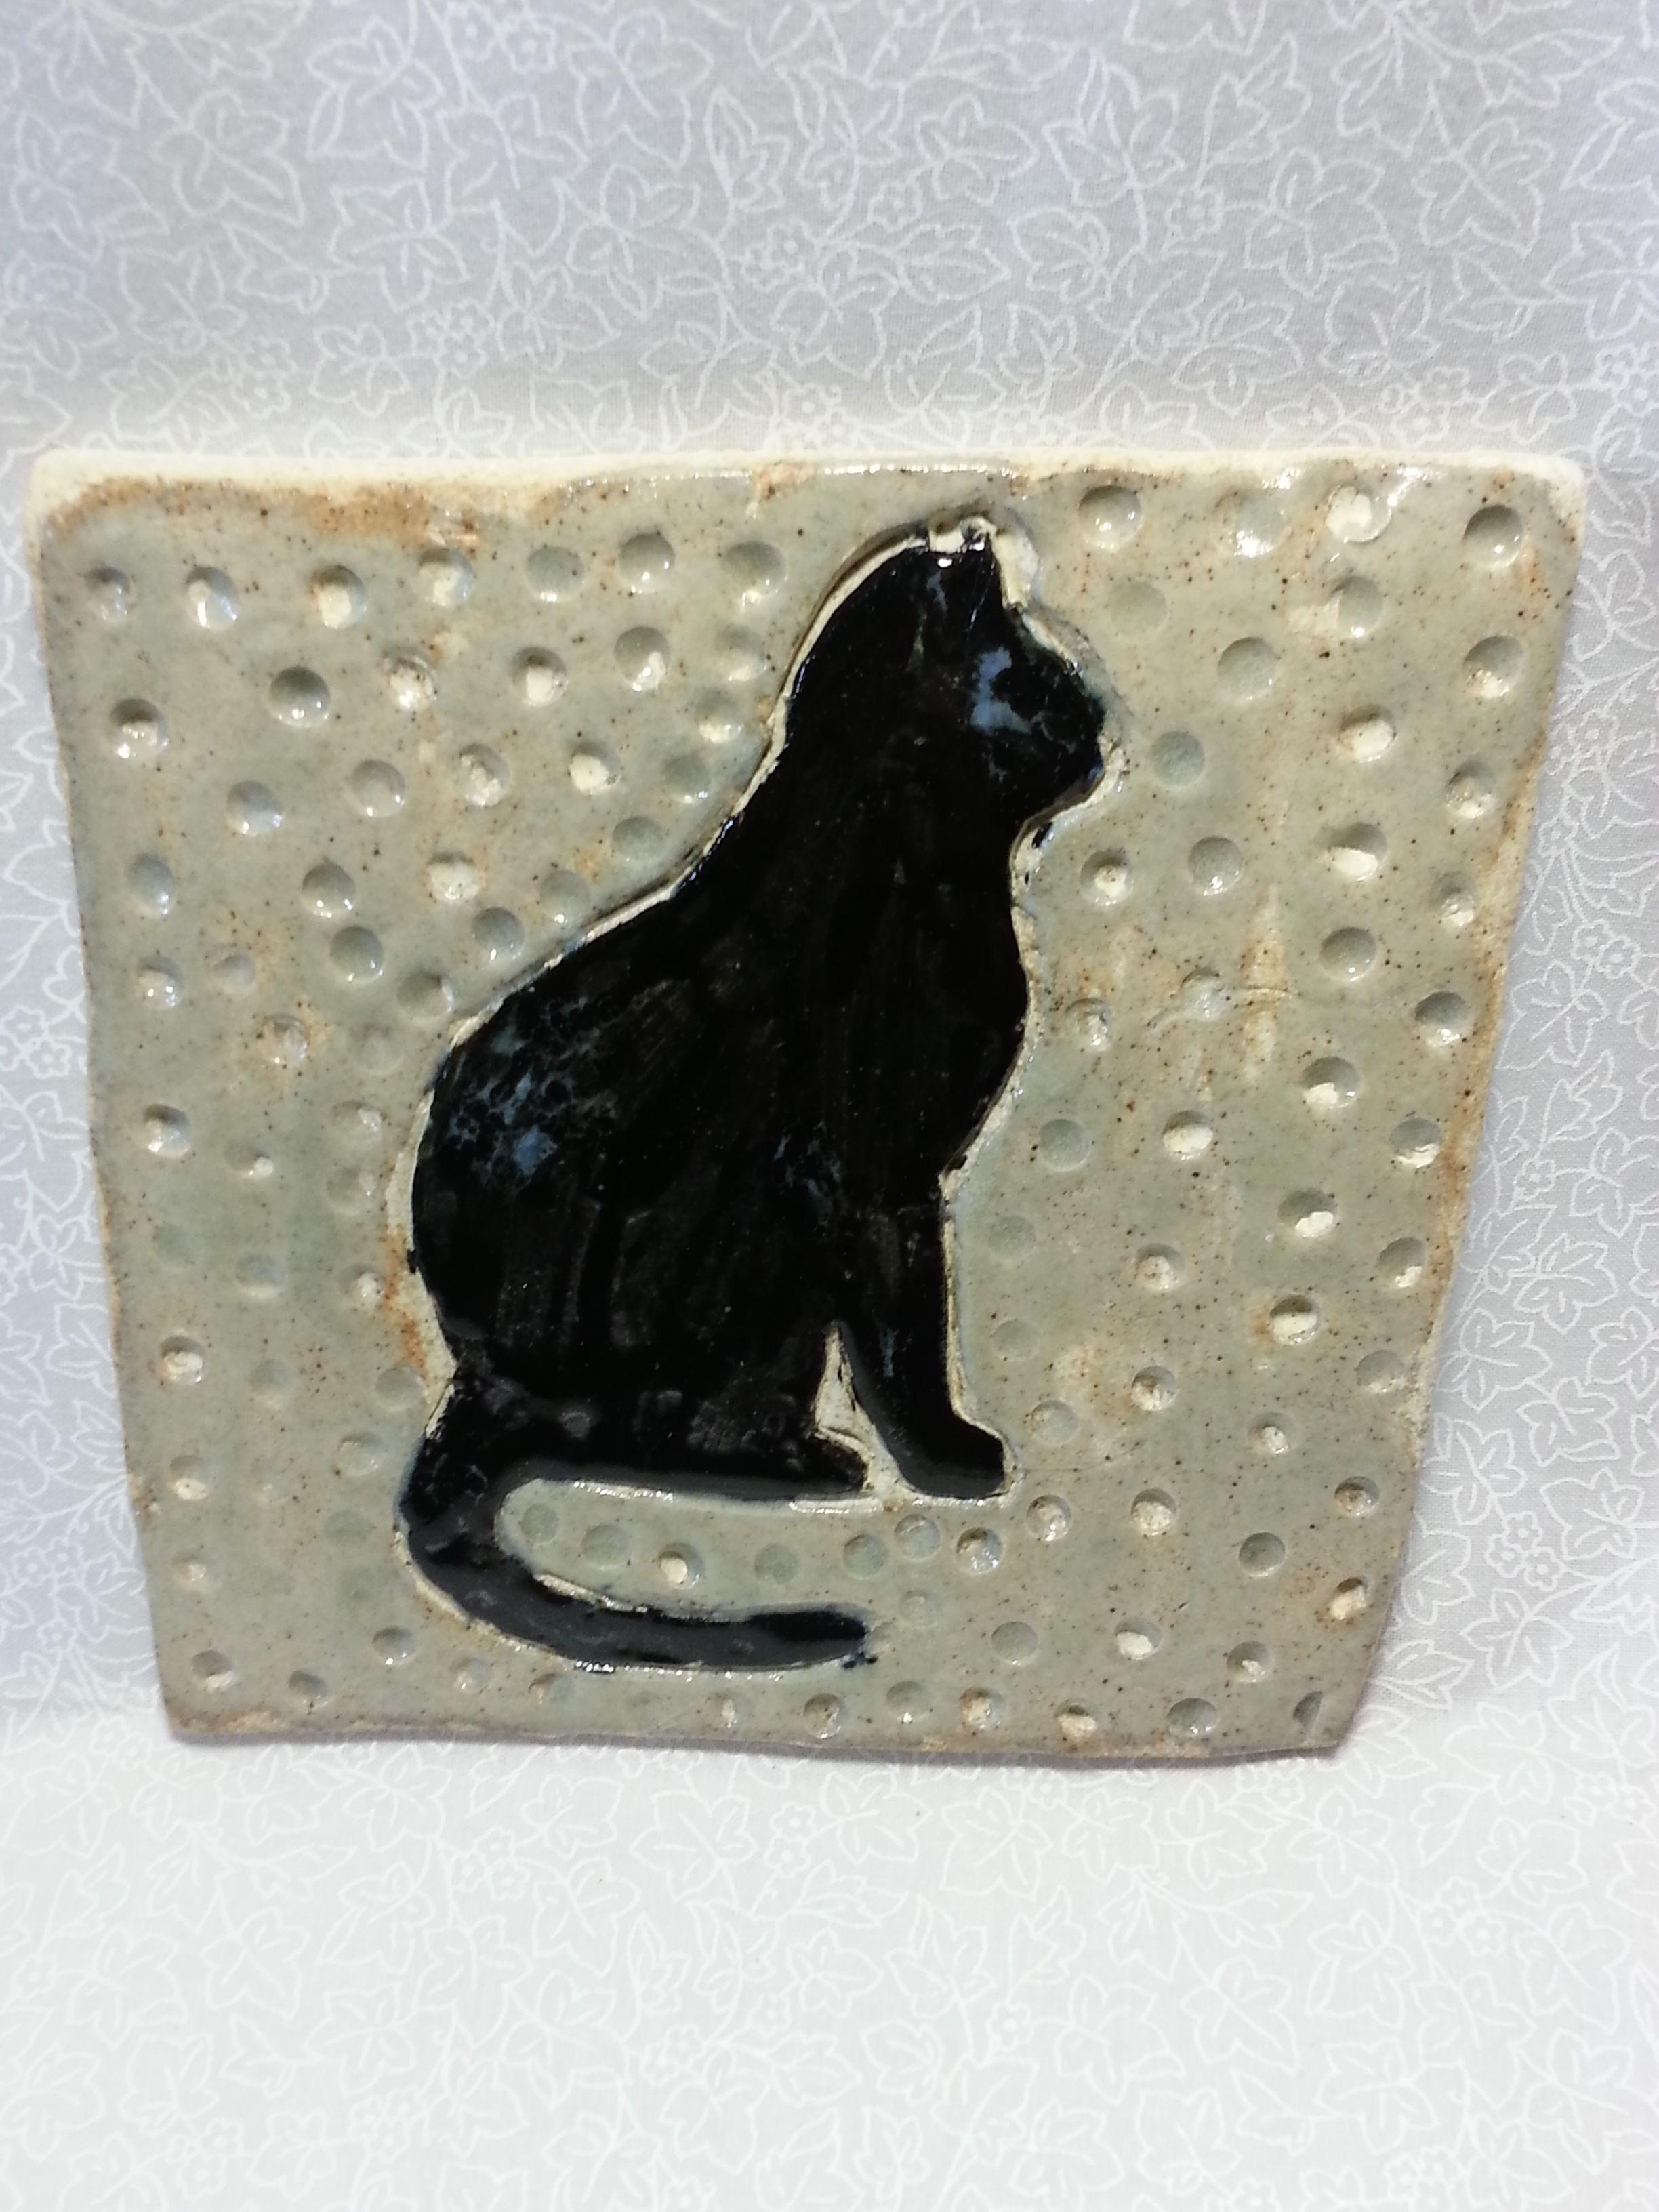 Samuel turner galileo ceramic tile turner samuel l samuel turner galileo ceramic tile dailygadgetfo Images